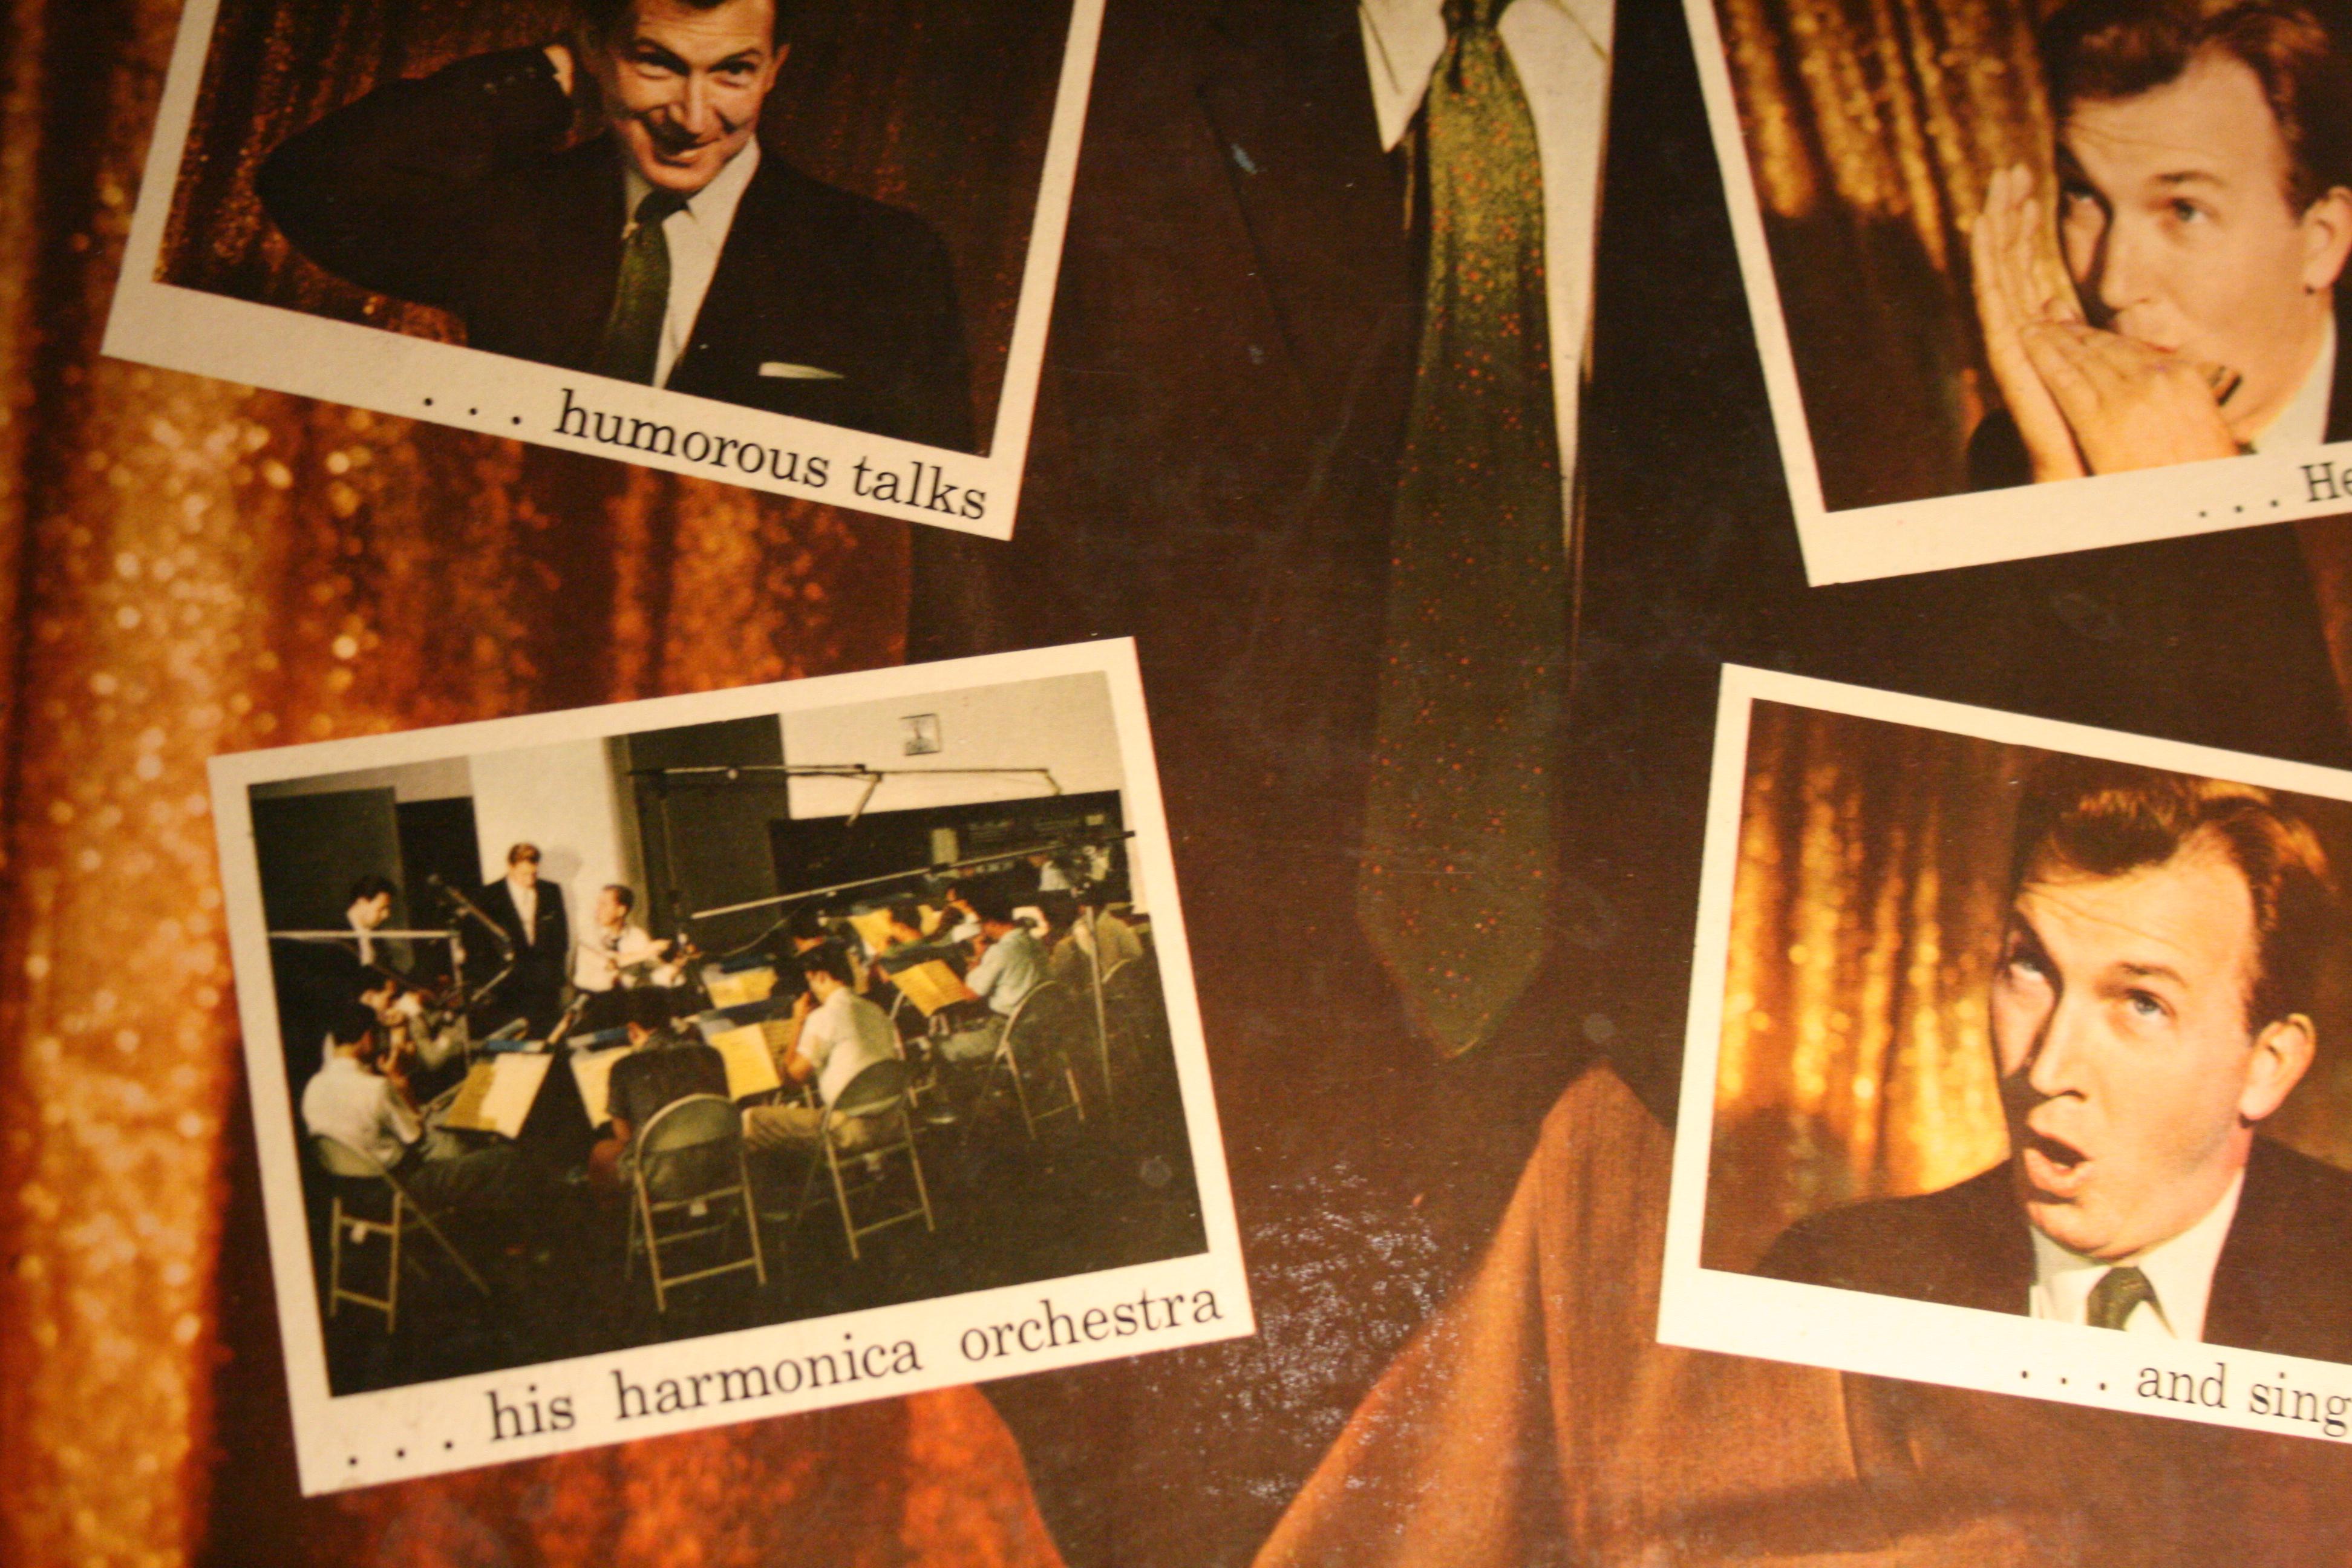 Herb Shriner's Harmonica Orchestra.